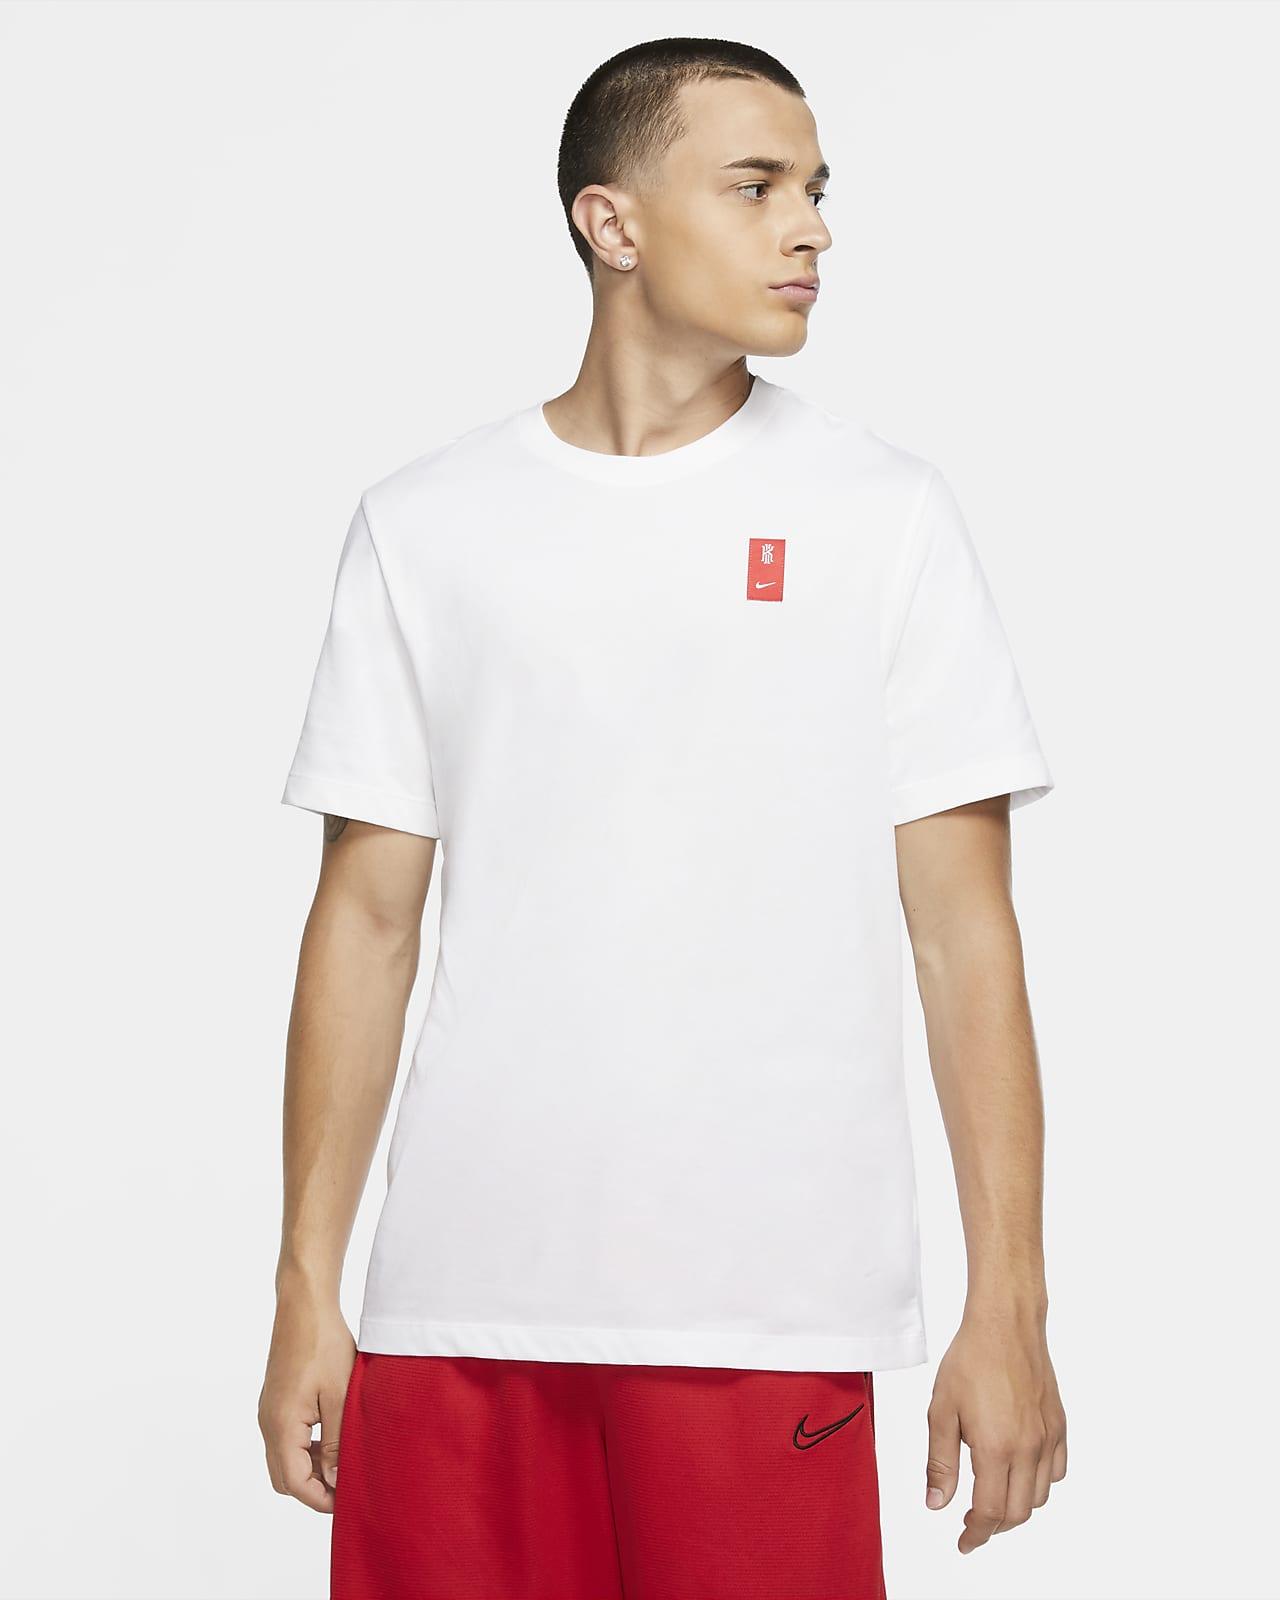 Nike Dri-FIT Kyrie Logo Men's Basketball T-Shirt